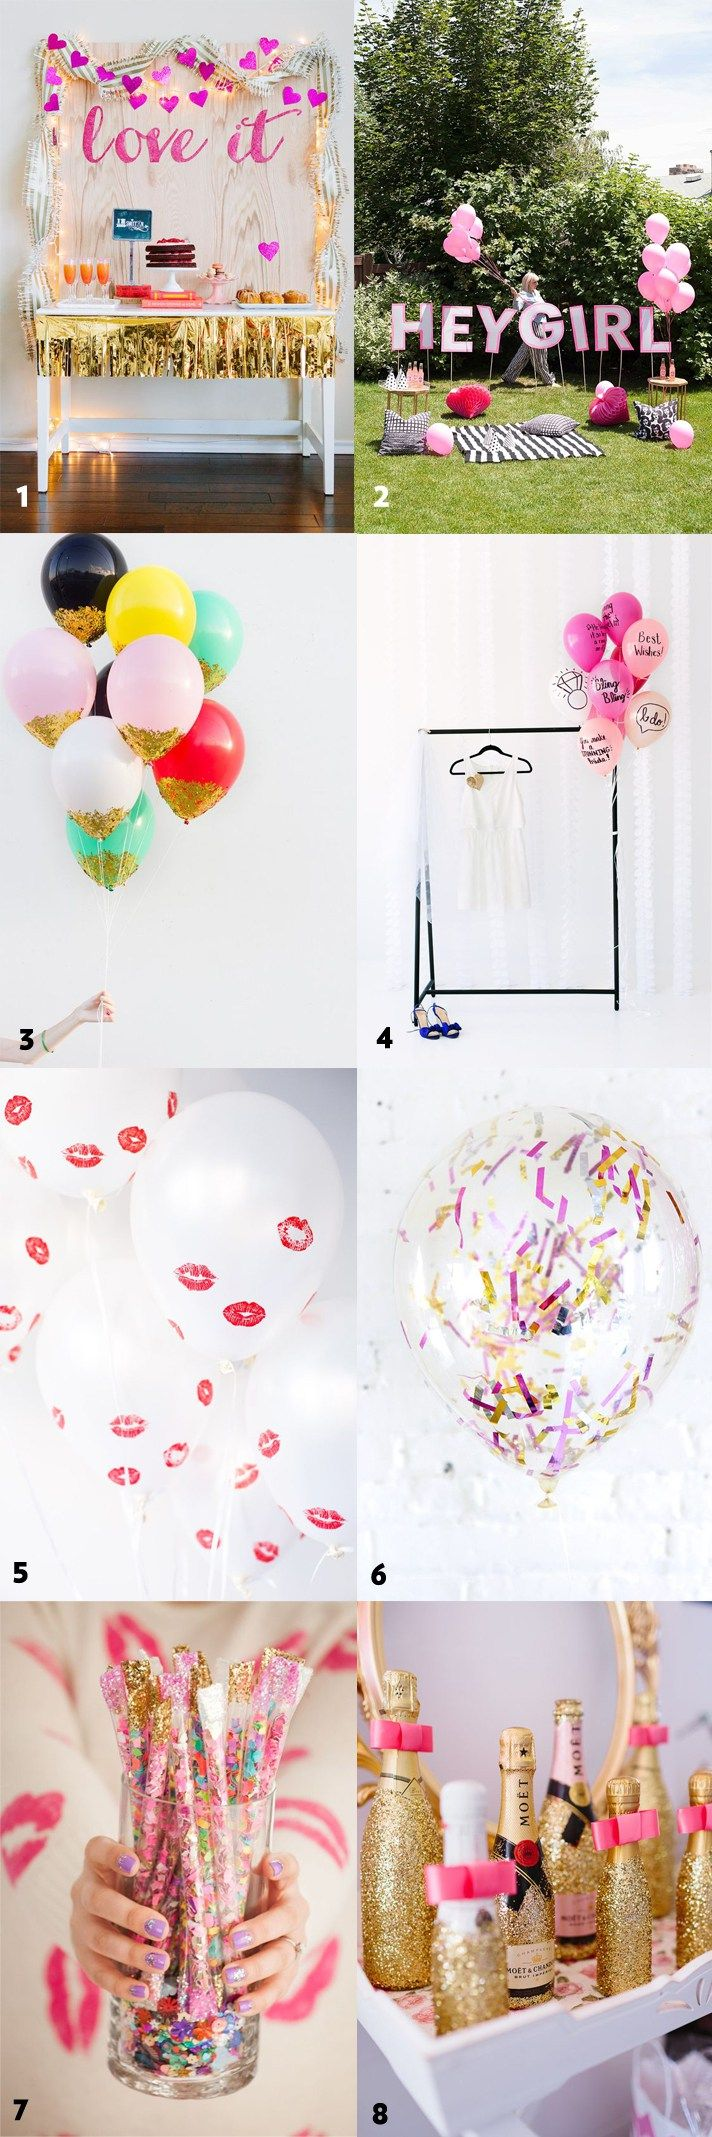 50 Simple and Stylish DIY Bridal Shower